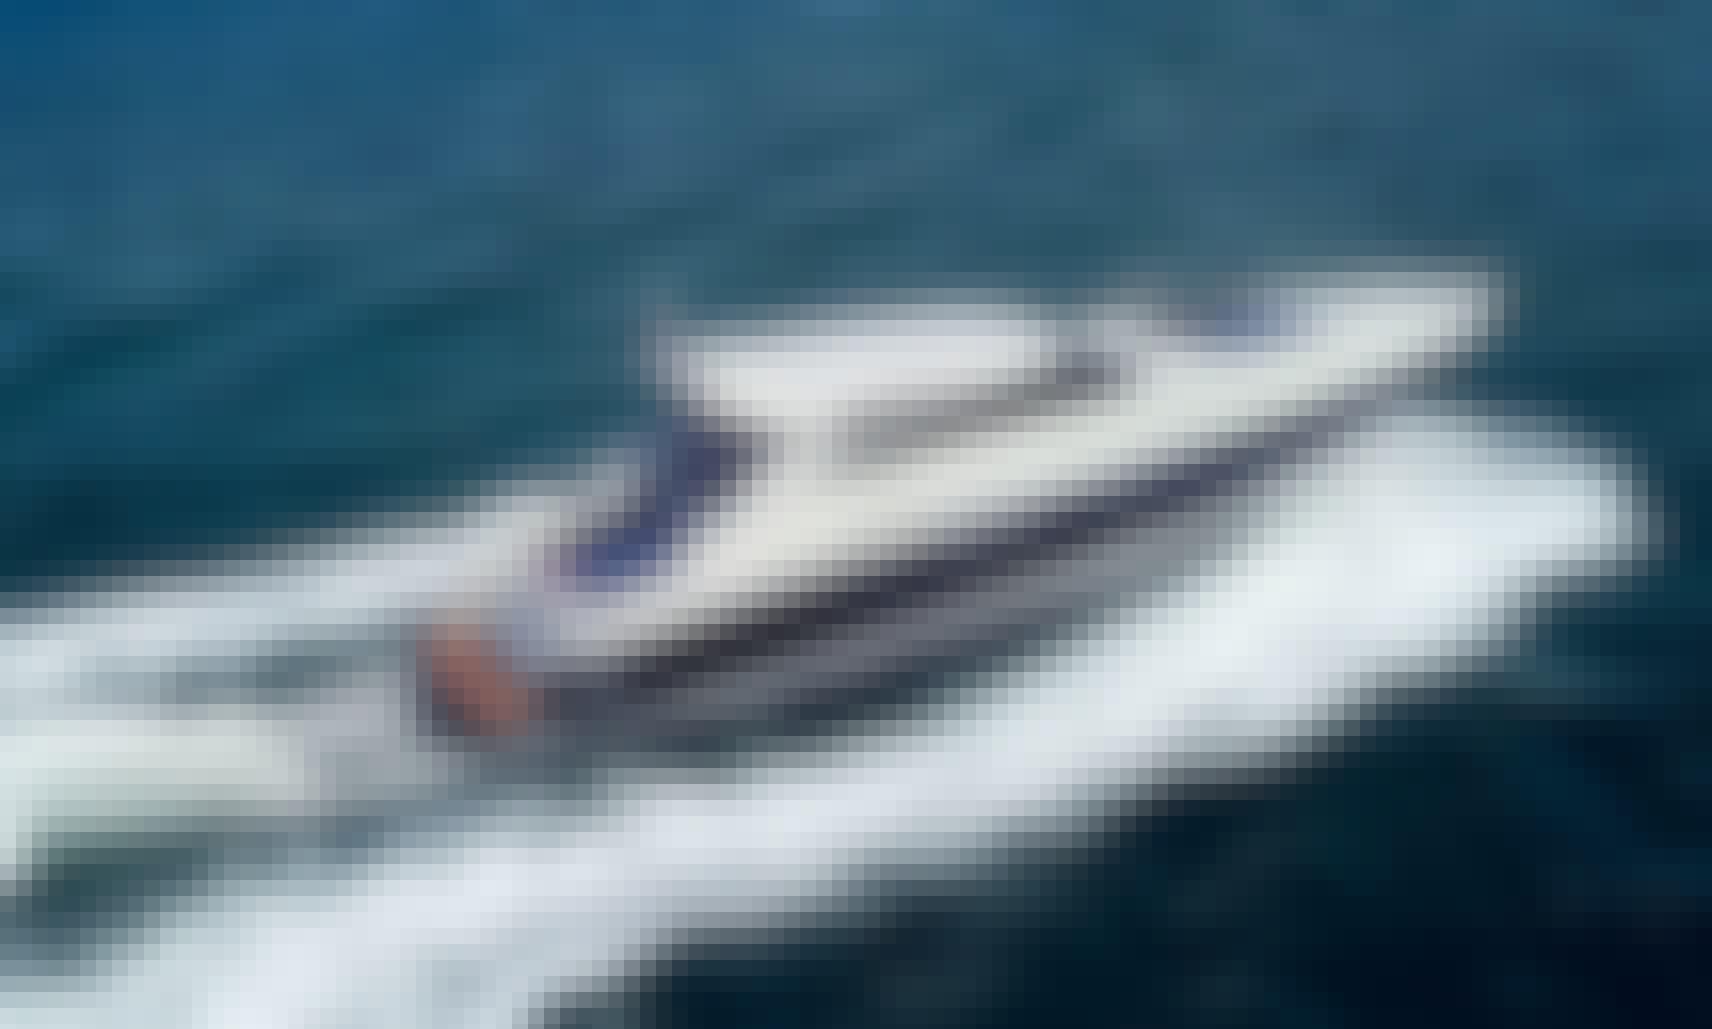 58ft Princess v58 Luxury Yacht Charter in t. Thomas, U.S. Virgin Islands